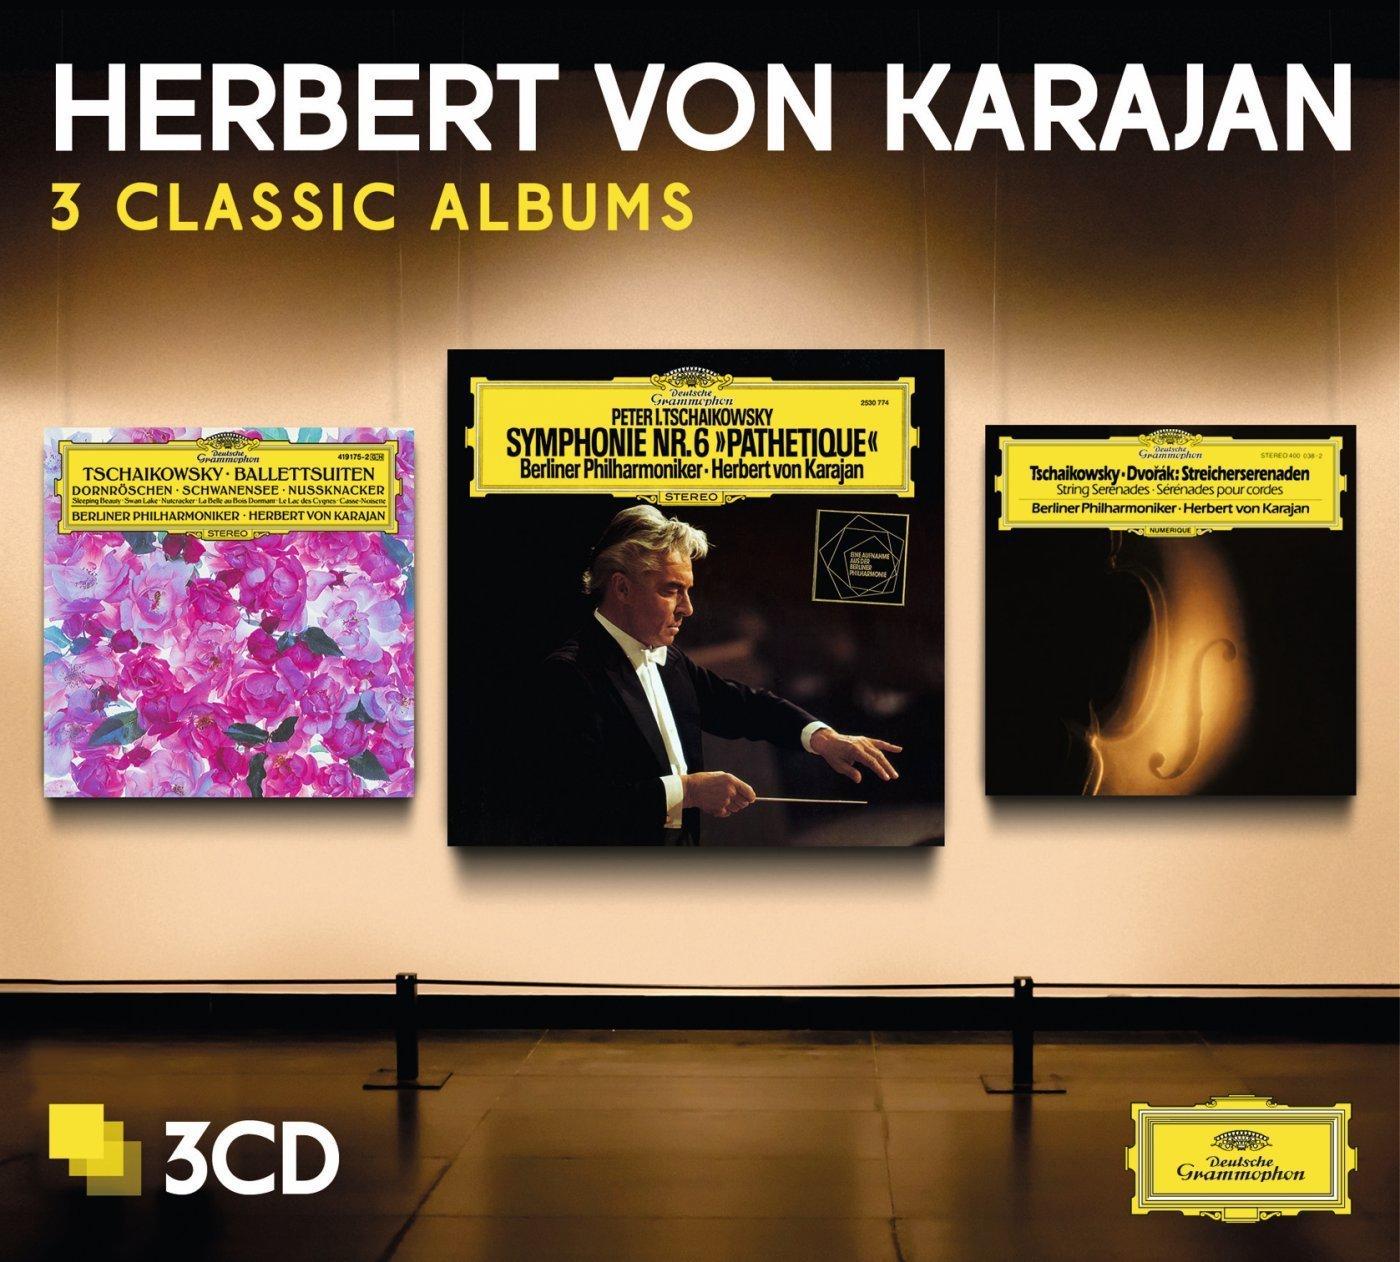 CD : Herbert von Karajan - Three Classic Albums (tchaikovsky) (Limited Edition, 3PC)